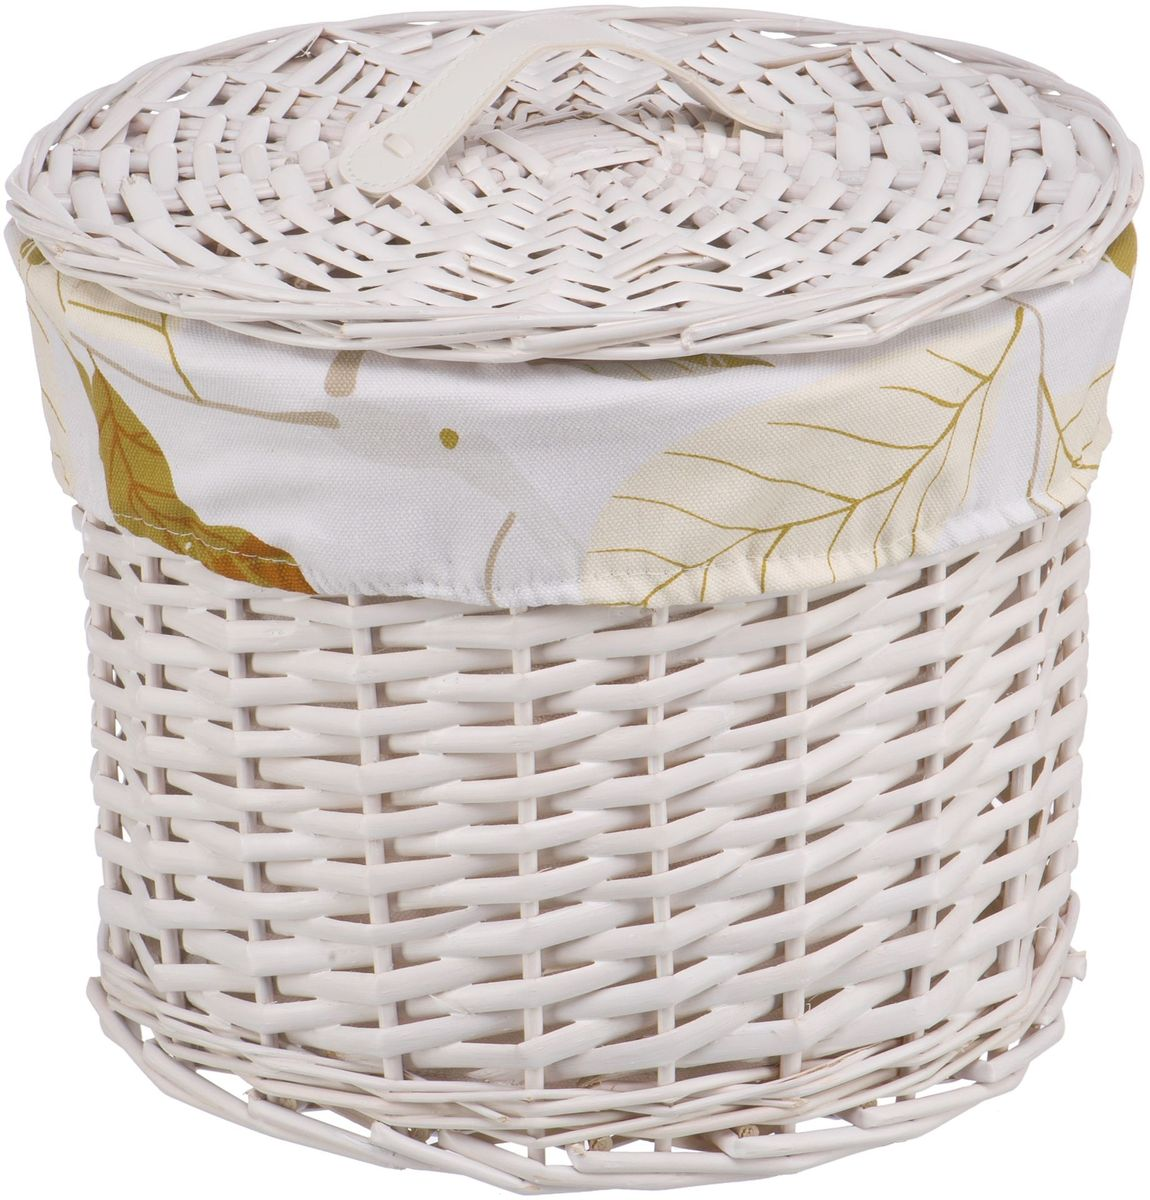 Корзина для белья Natural House  Листья , цвет: белый, 30 х 30 х 25 см - Корзины для белья